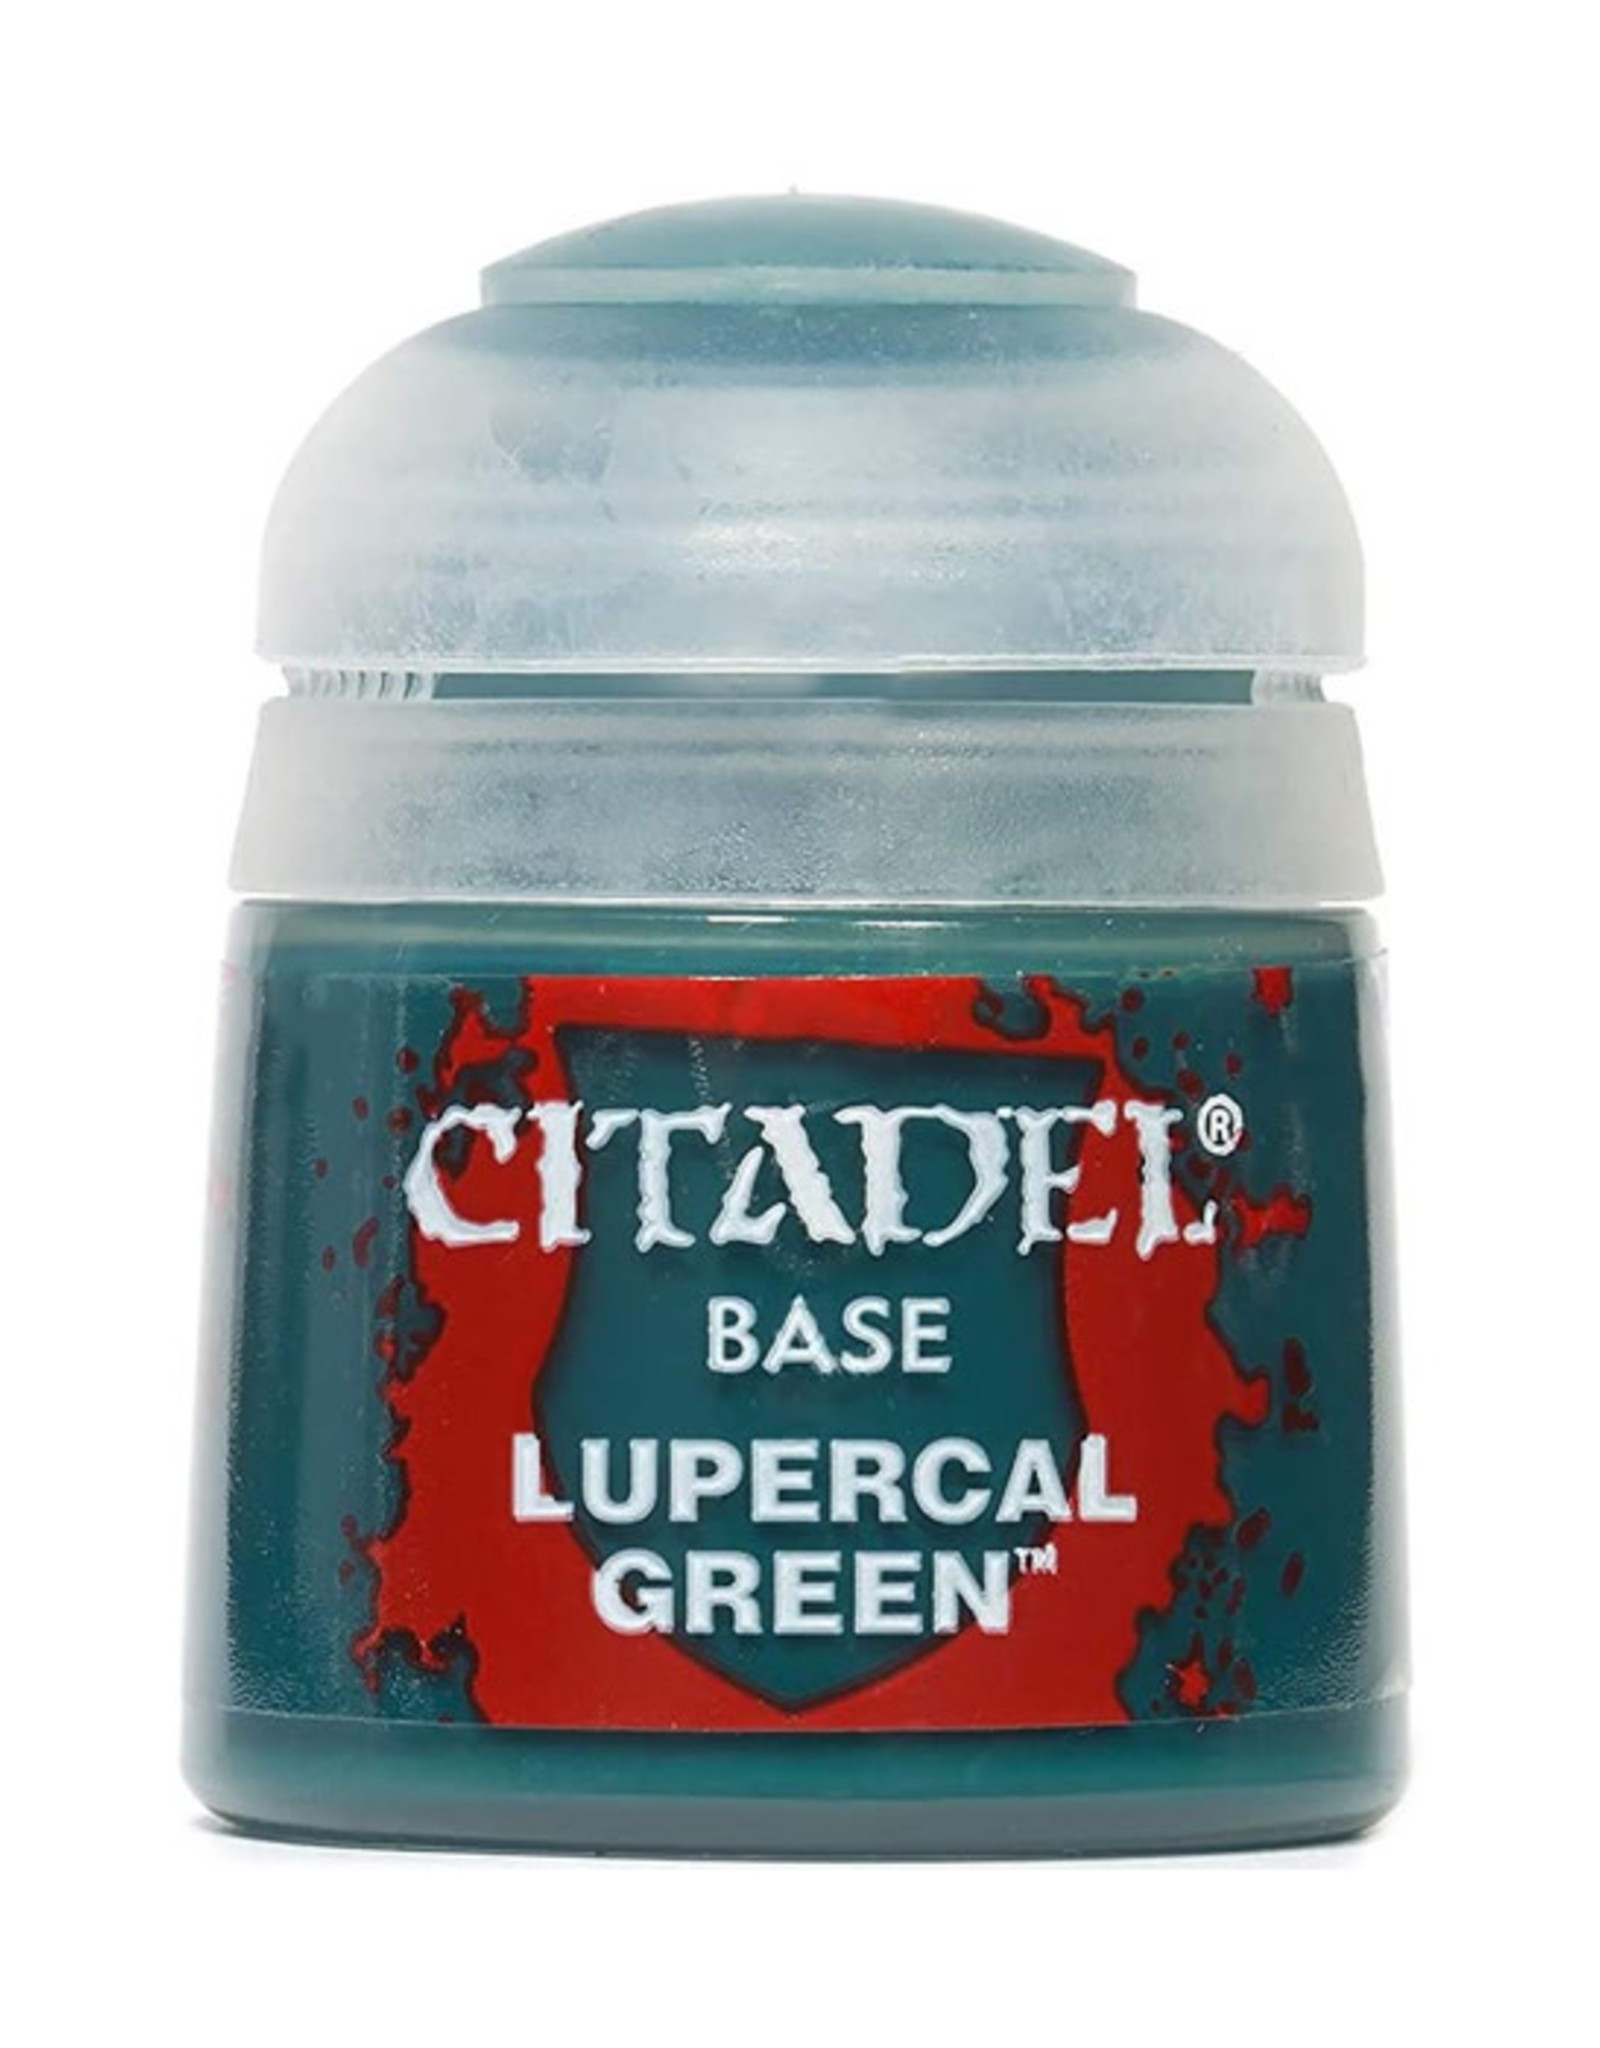 Citadel Citadel Colour: Base - Lupercal Green